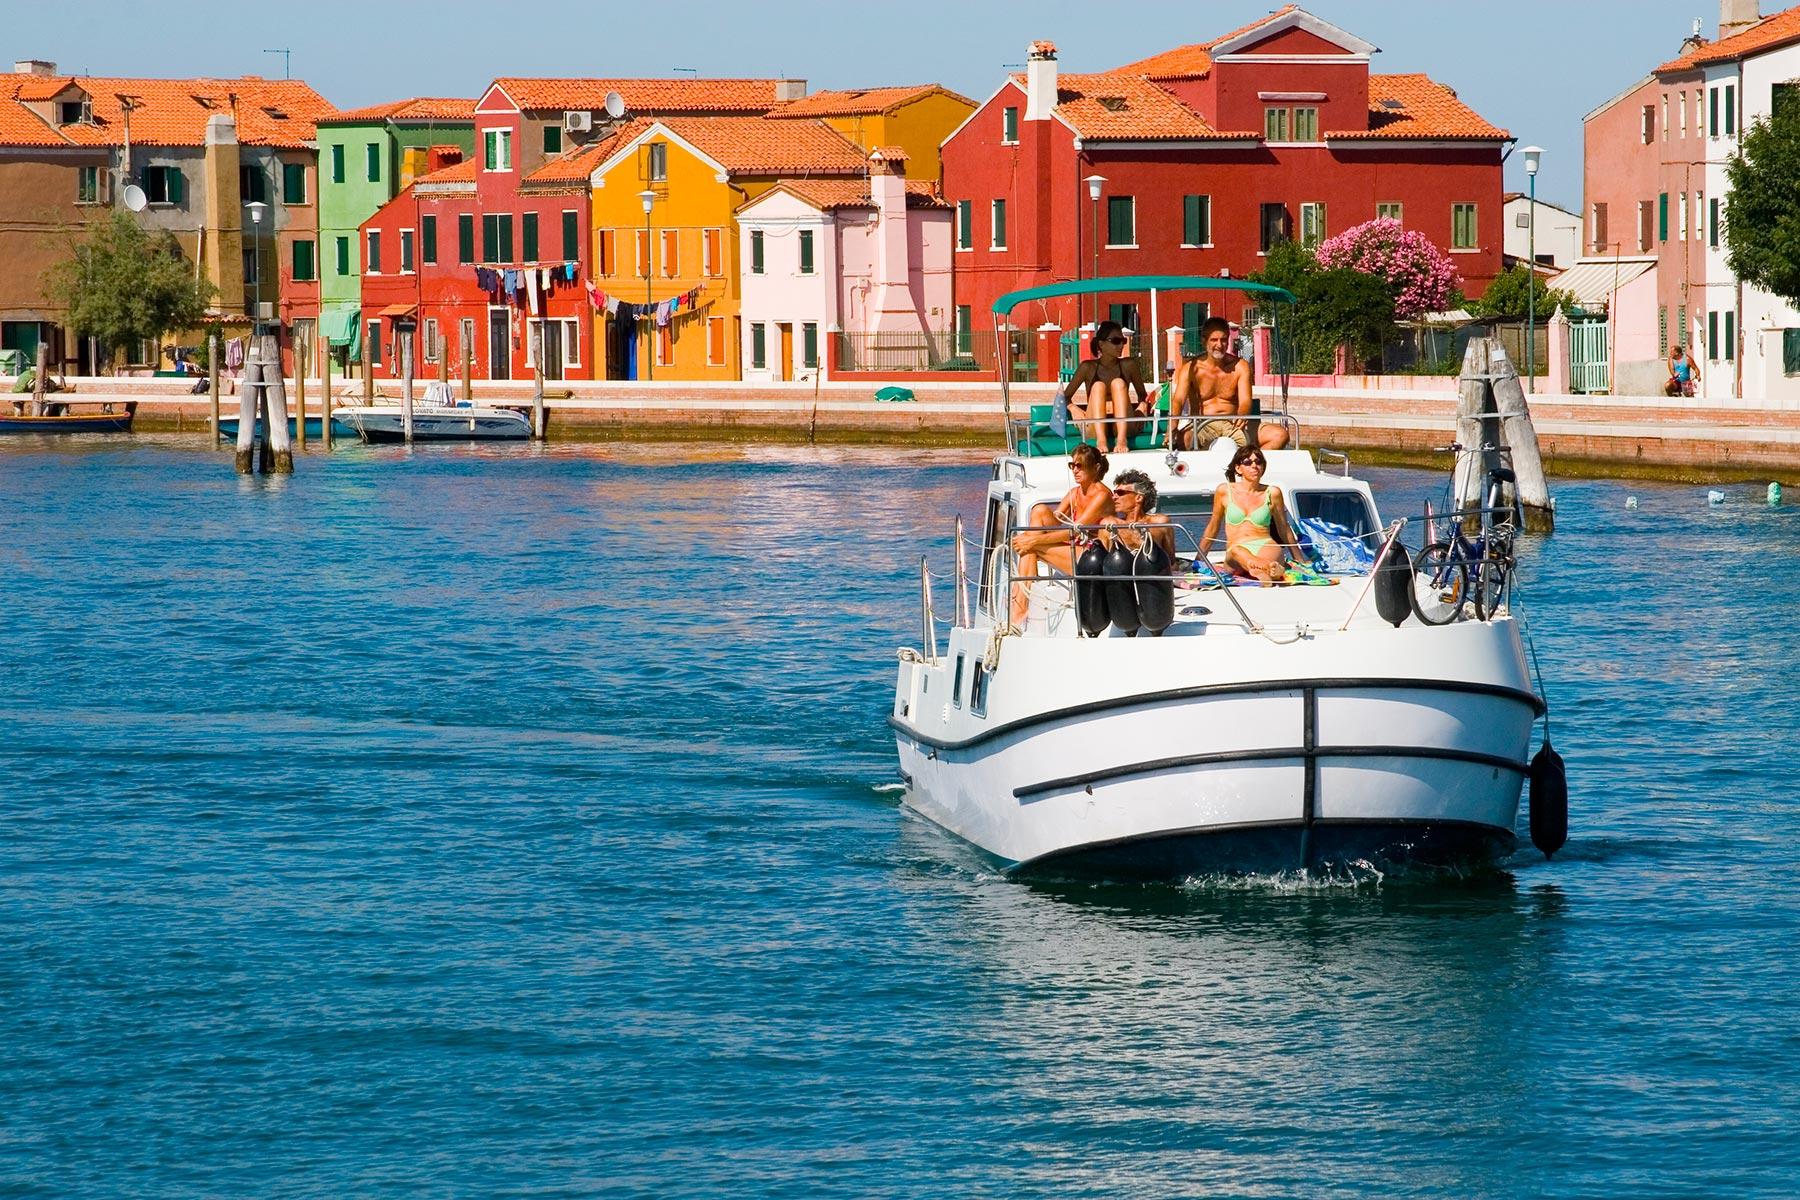 Lebenswertes Boot Hausboot Burano Ferien bunte Häuser